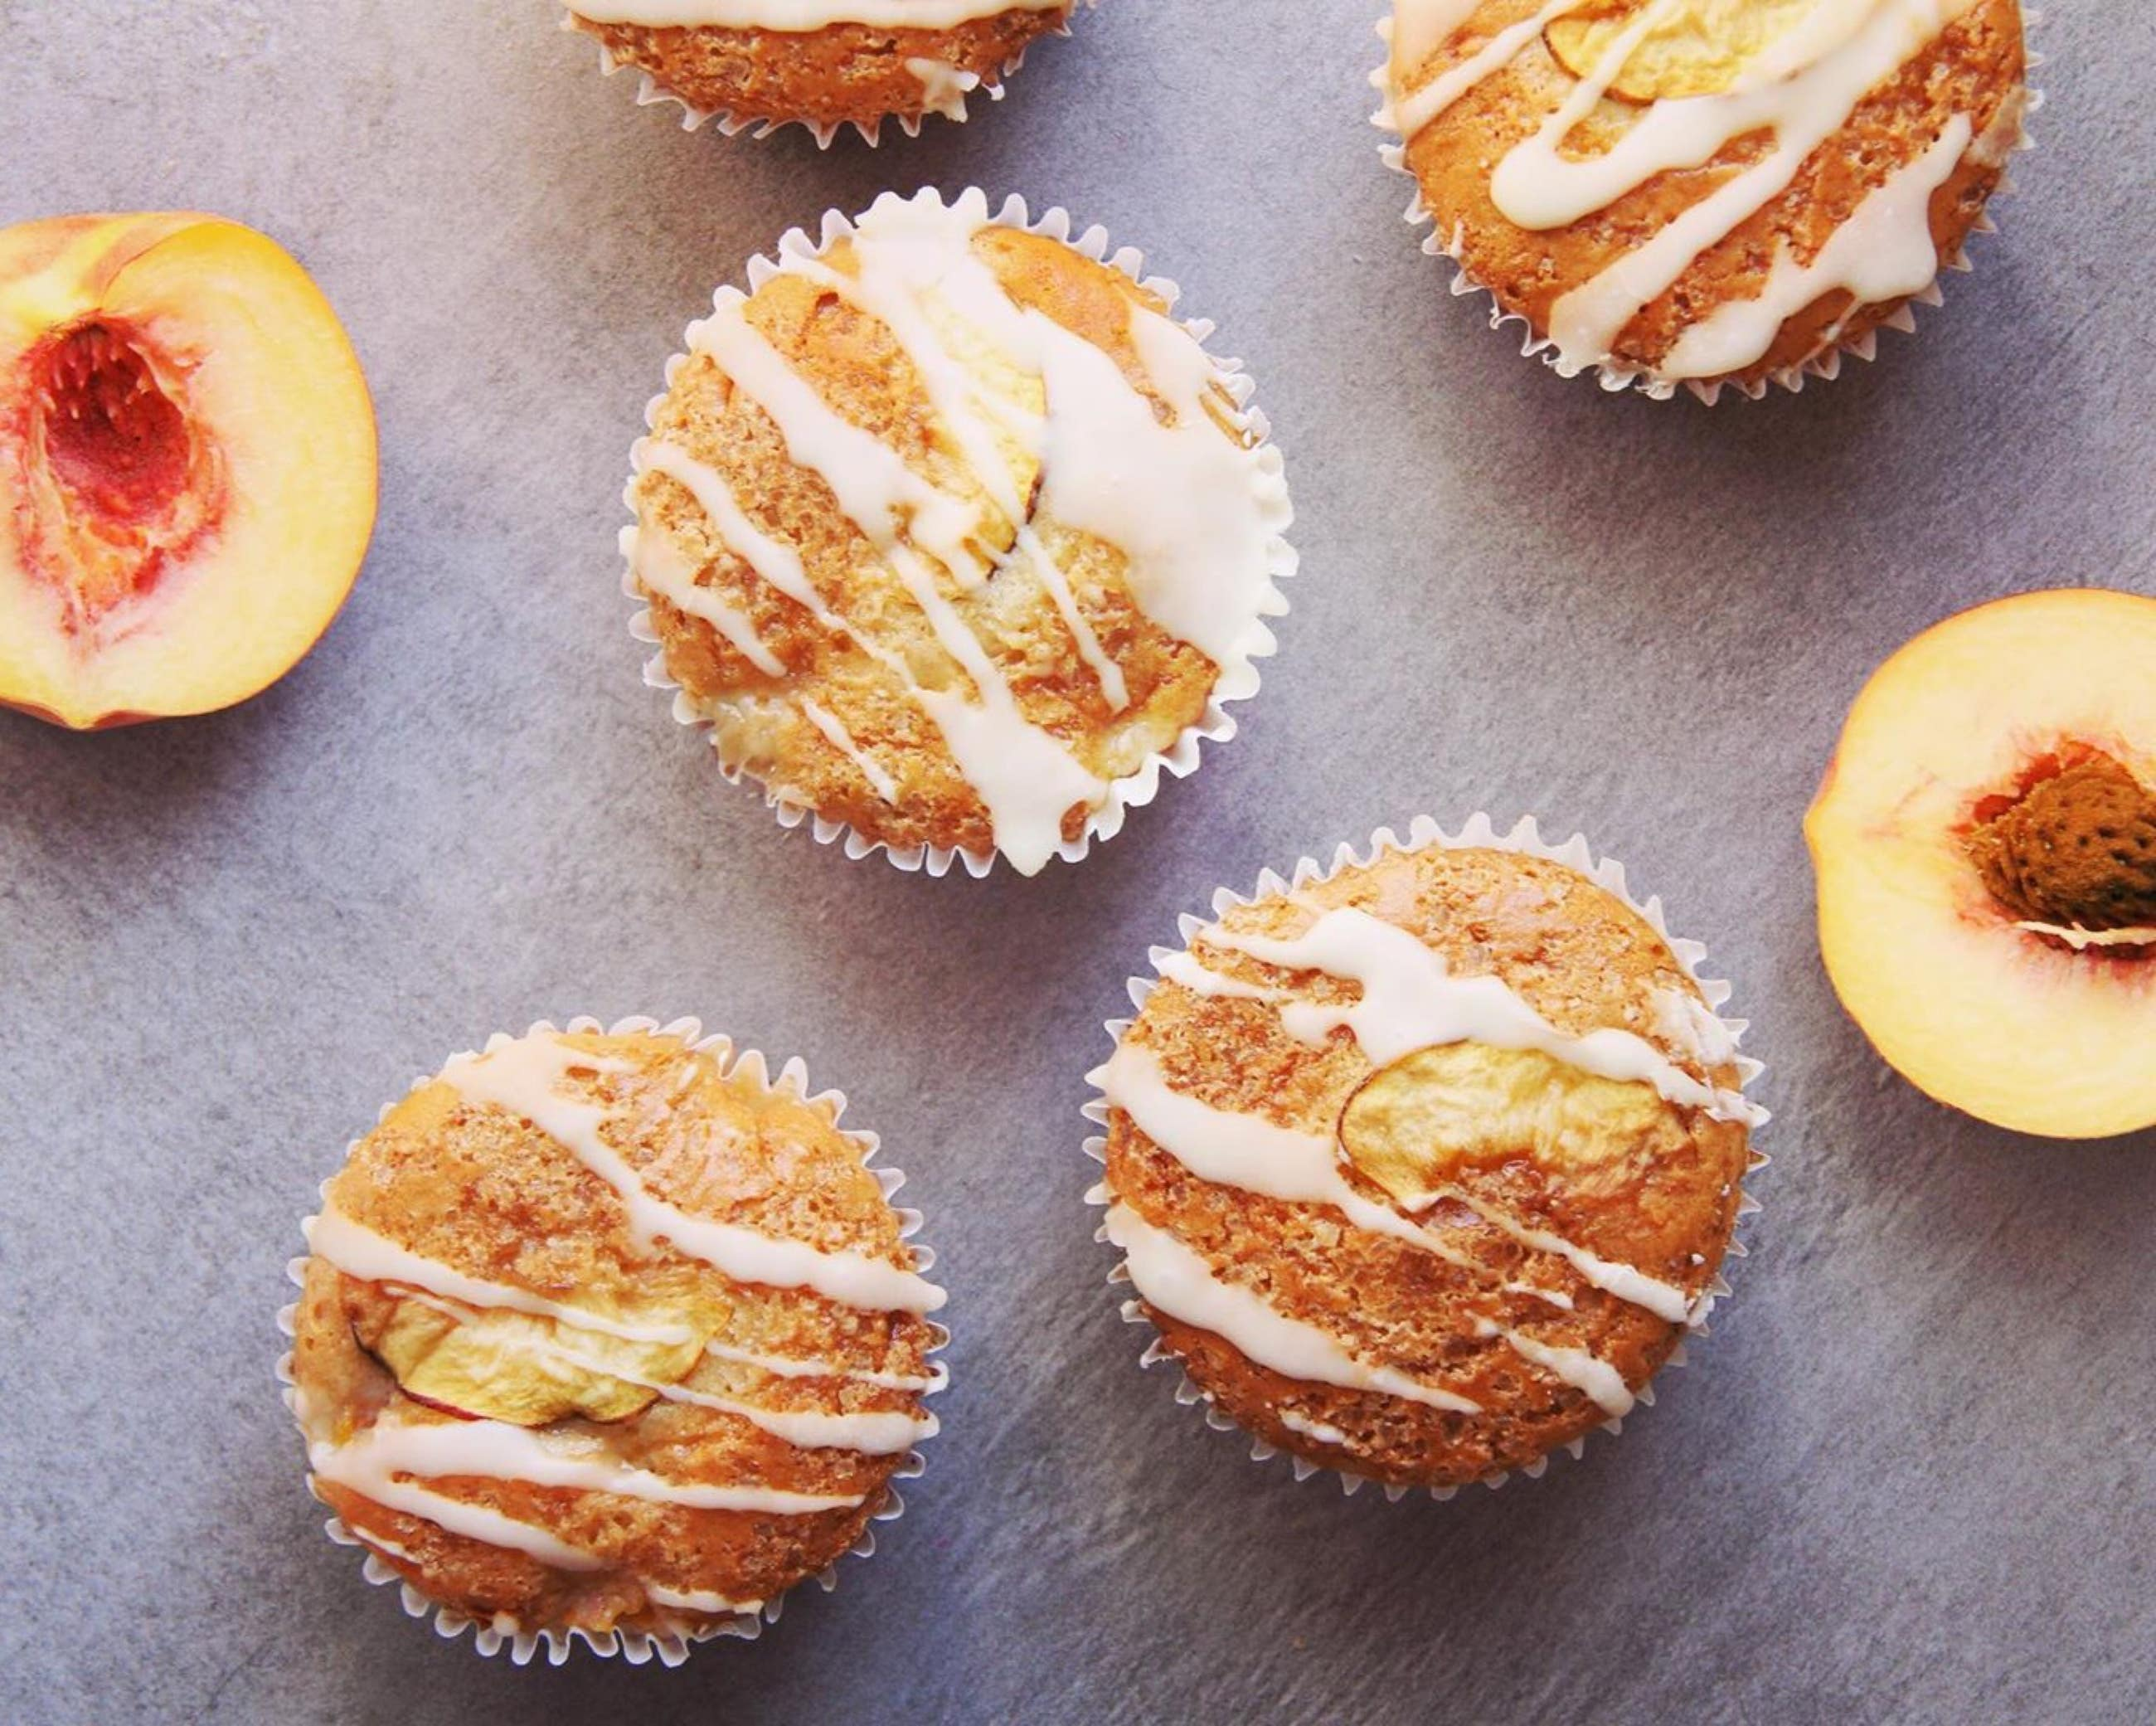 Vegan Peaches & Cream Muffins at The Good Good